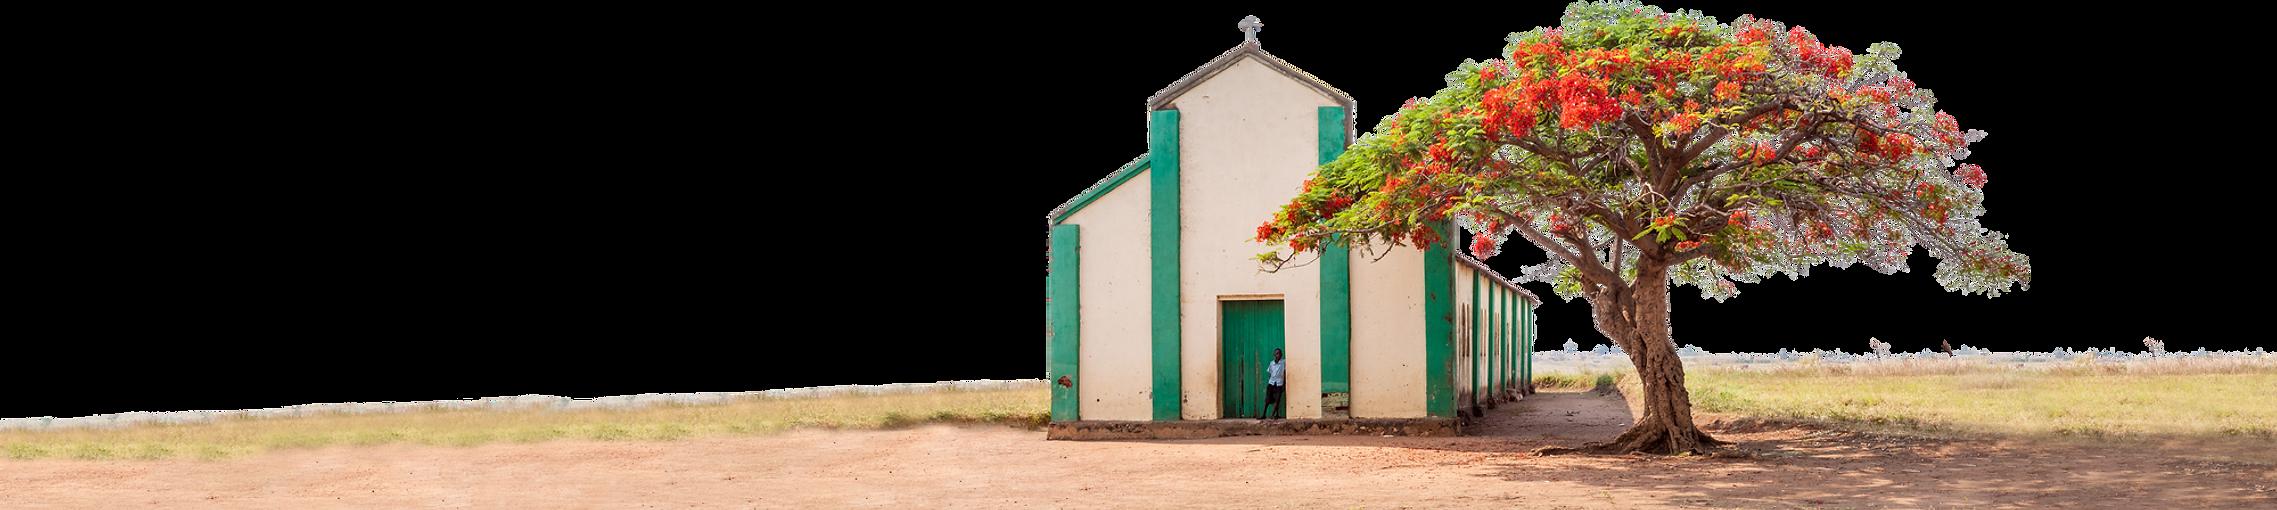 Church half size 20140129-IMG_1751.png